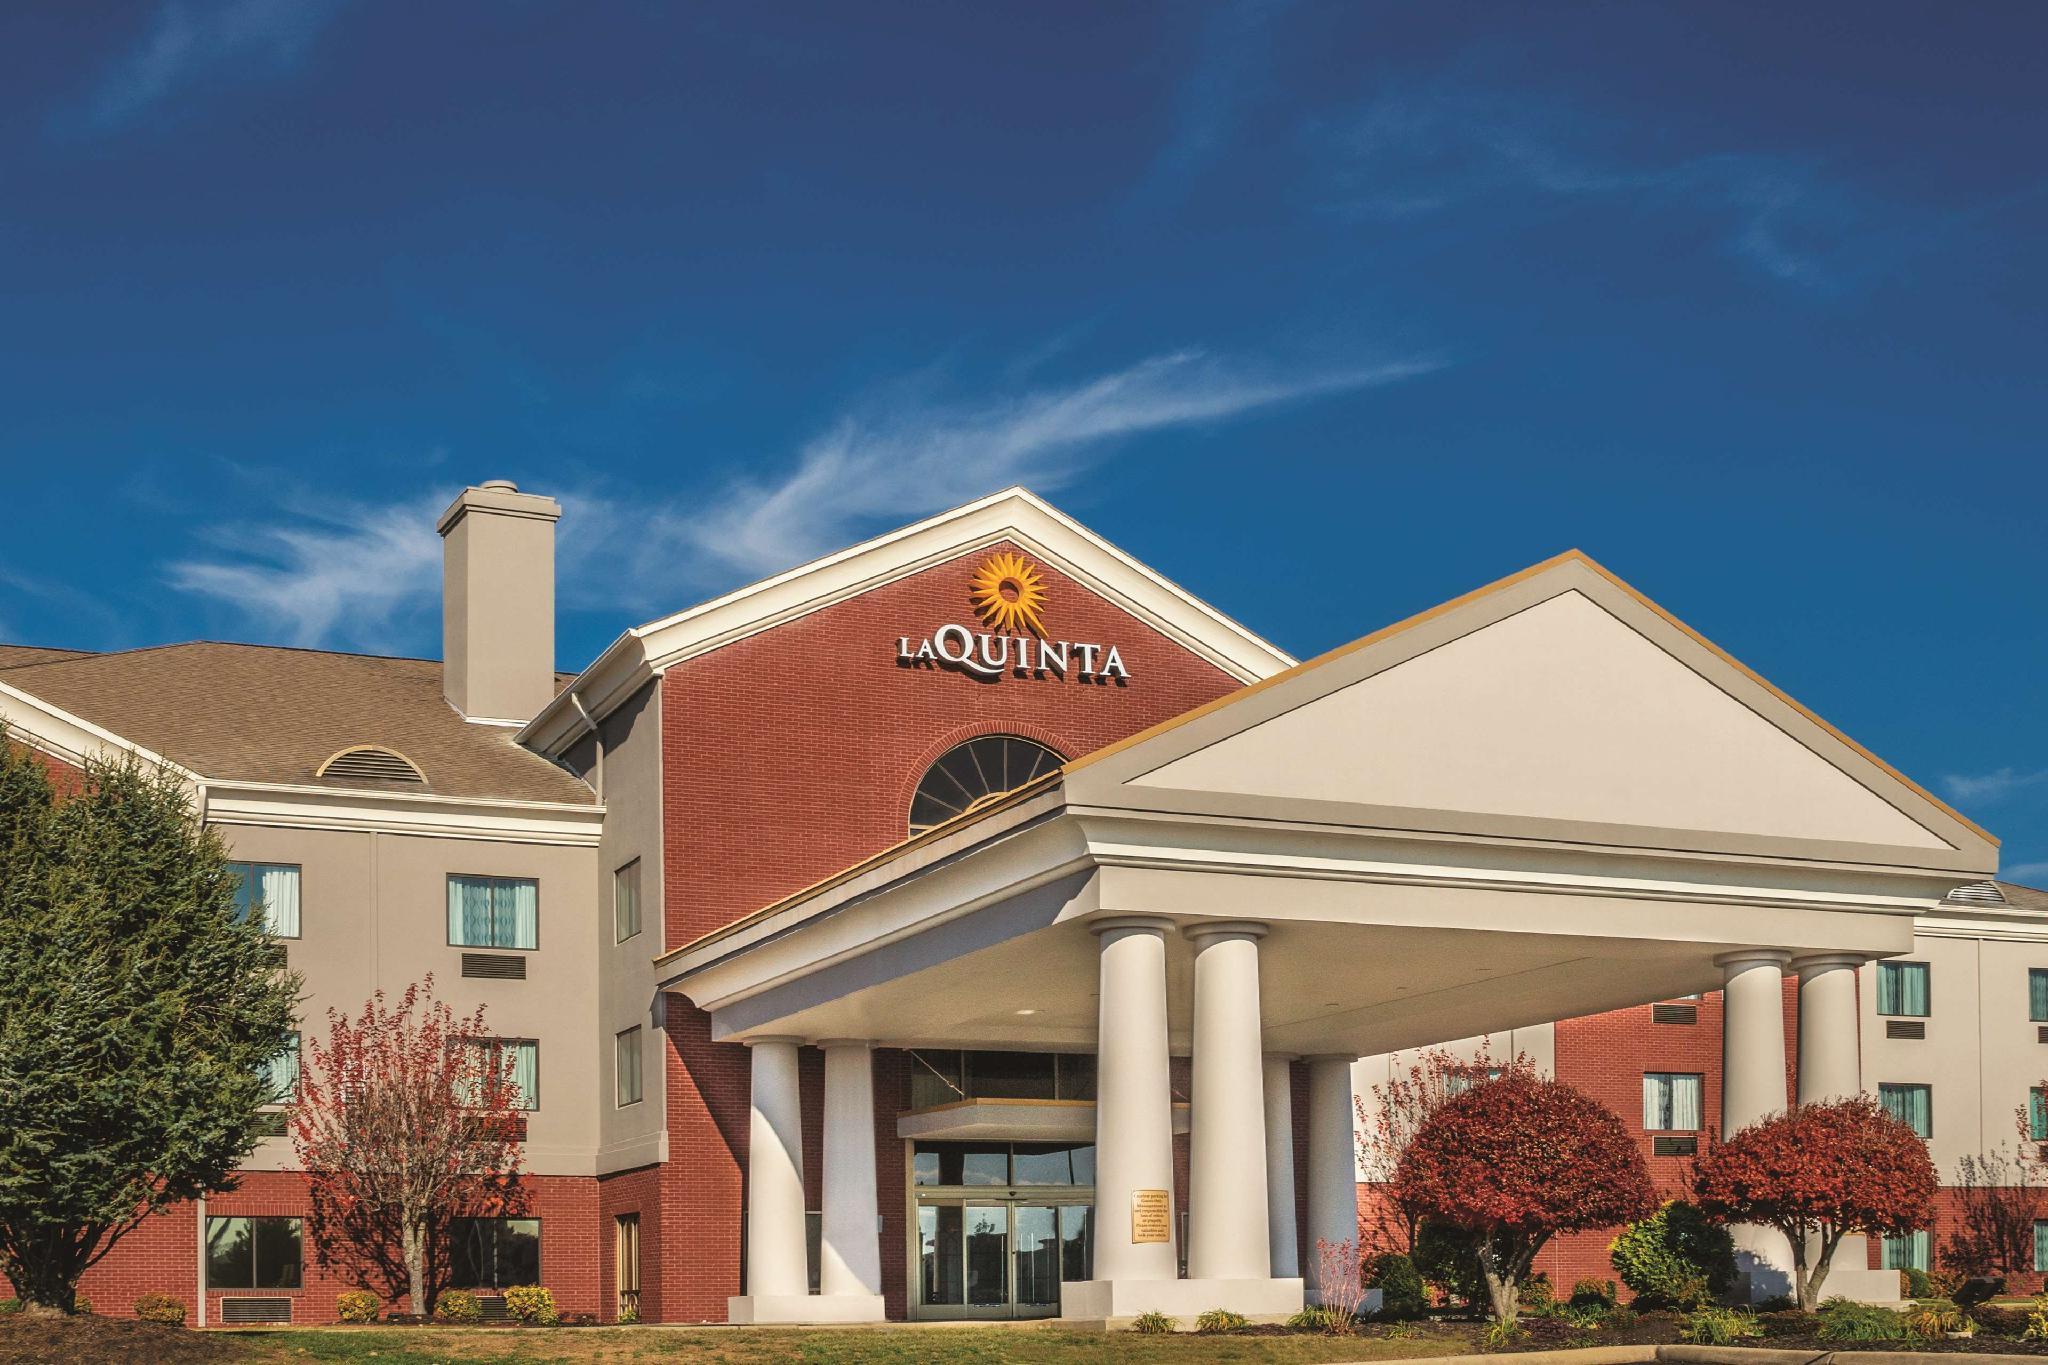 La Quinta Inn And Suites By Wyndham Loudon